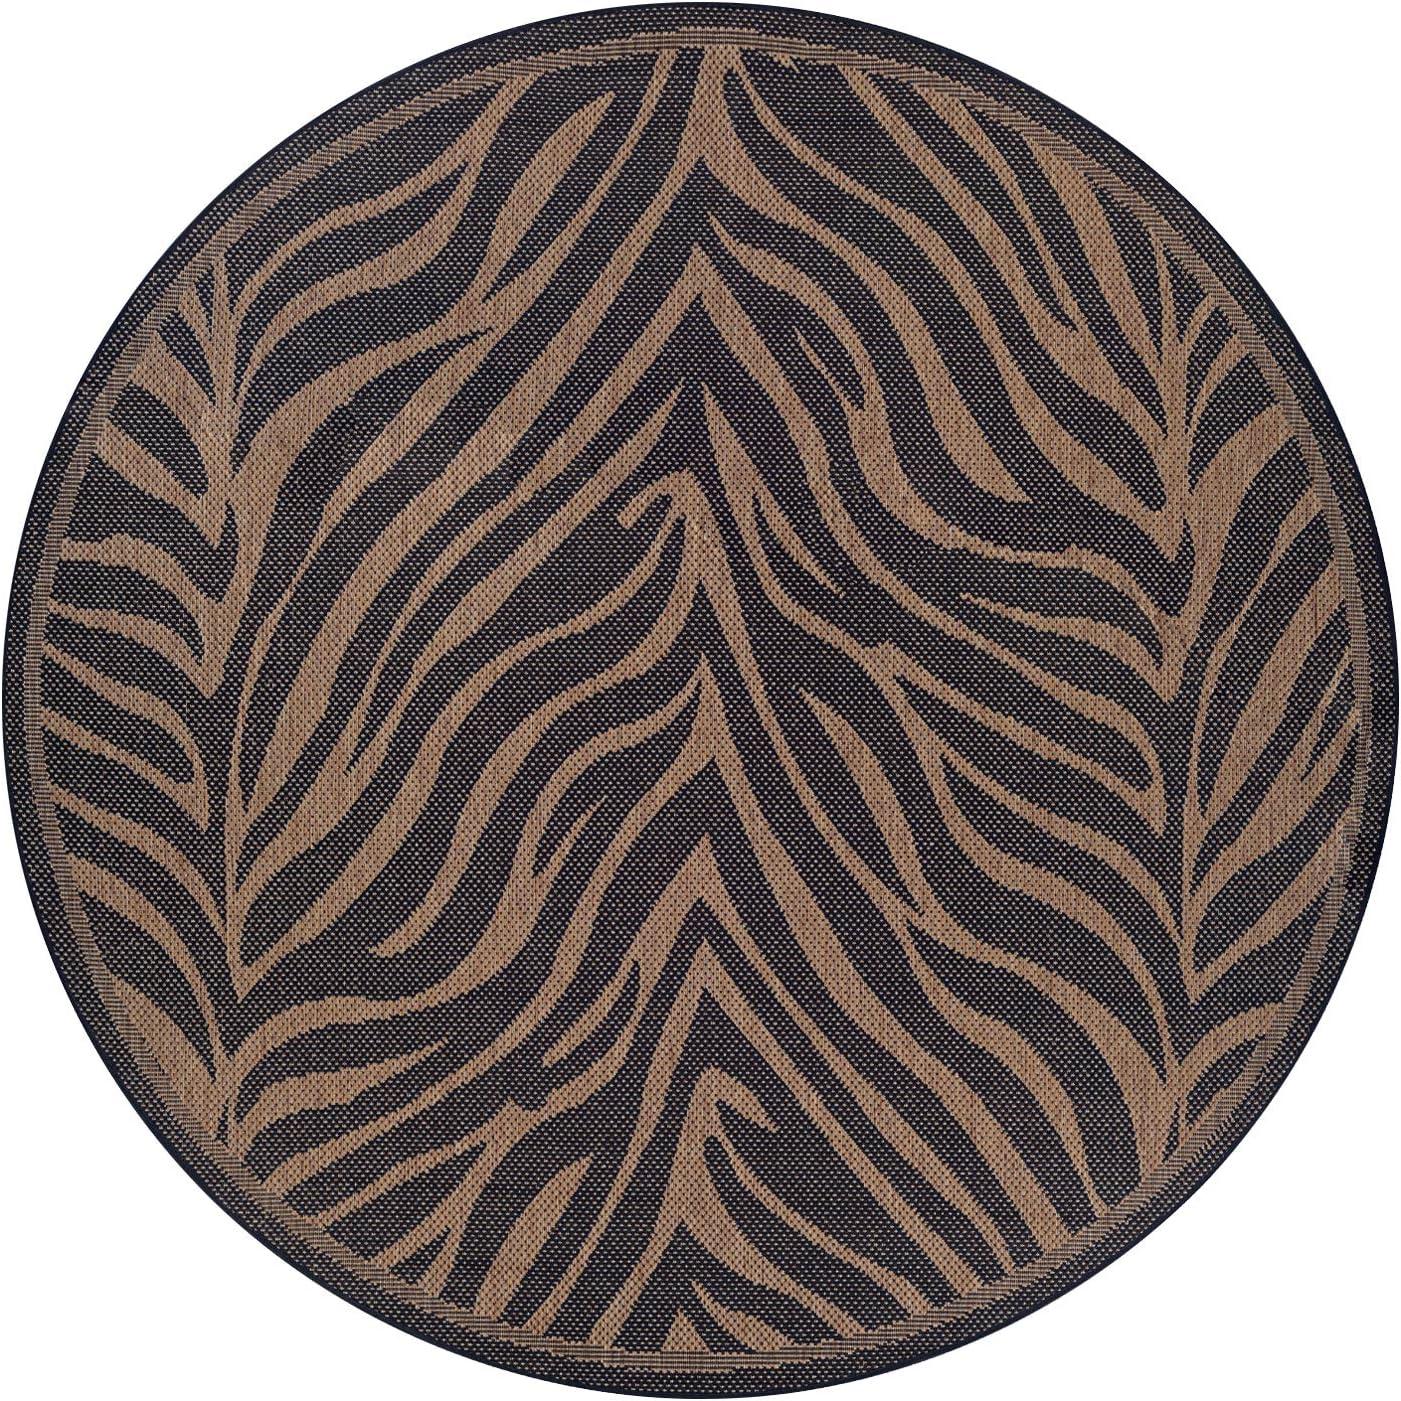 Couristan Round Recife Zebra Rug, 8-Feet 6-Inch, Black Cocoa